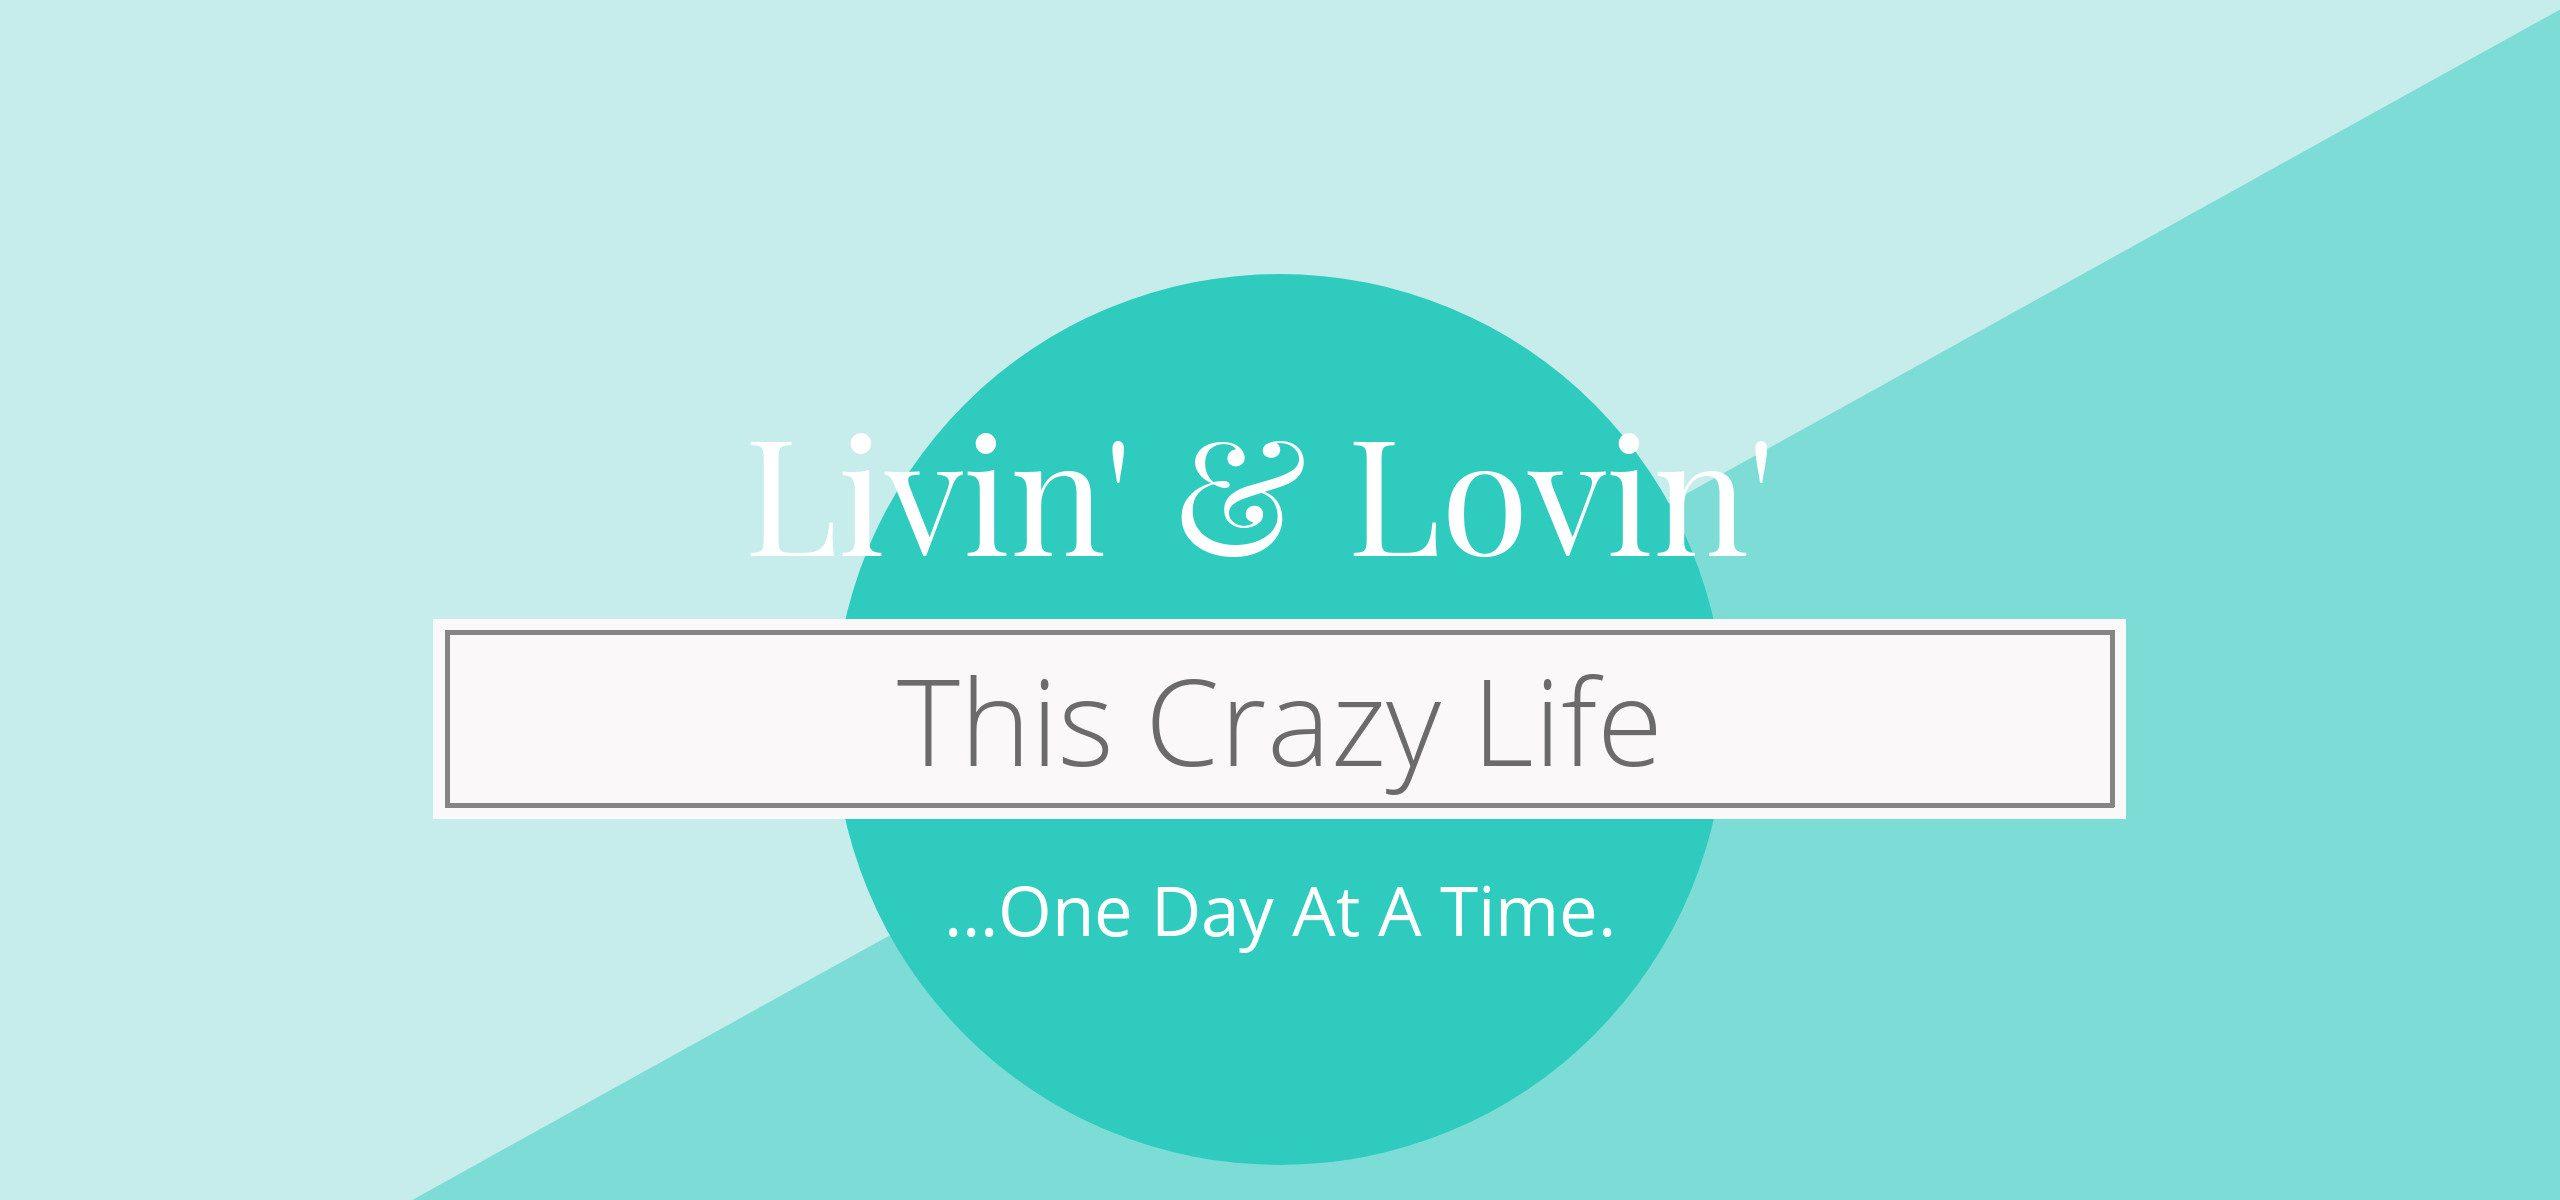 Livin' & Lovin' This Crazy Life